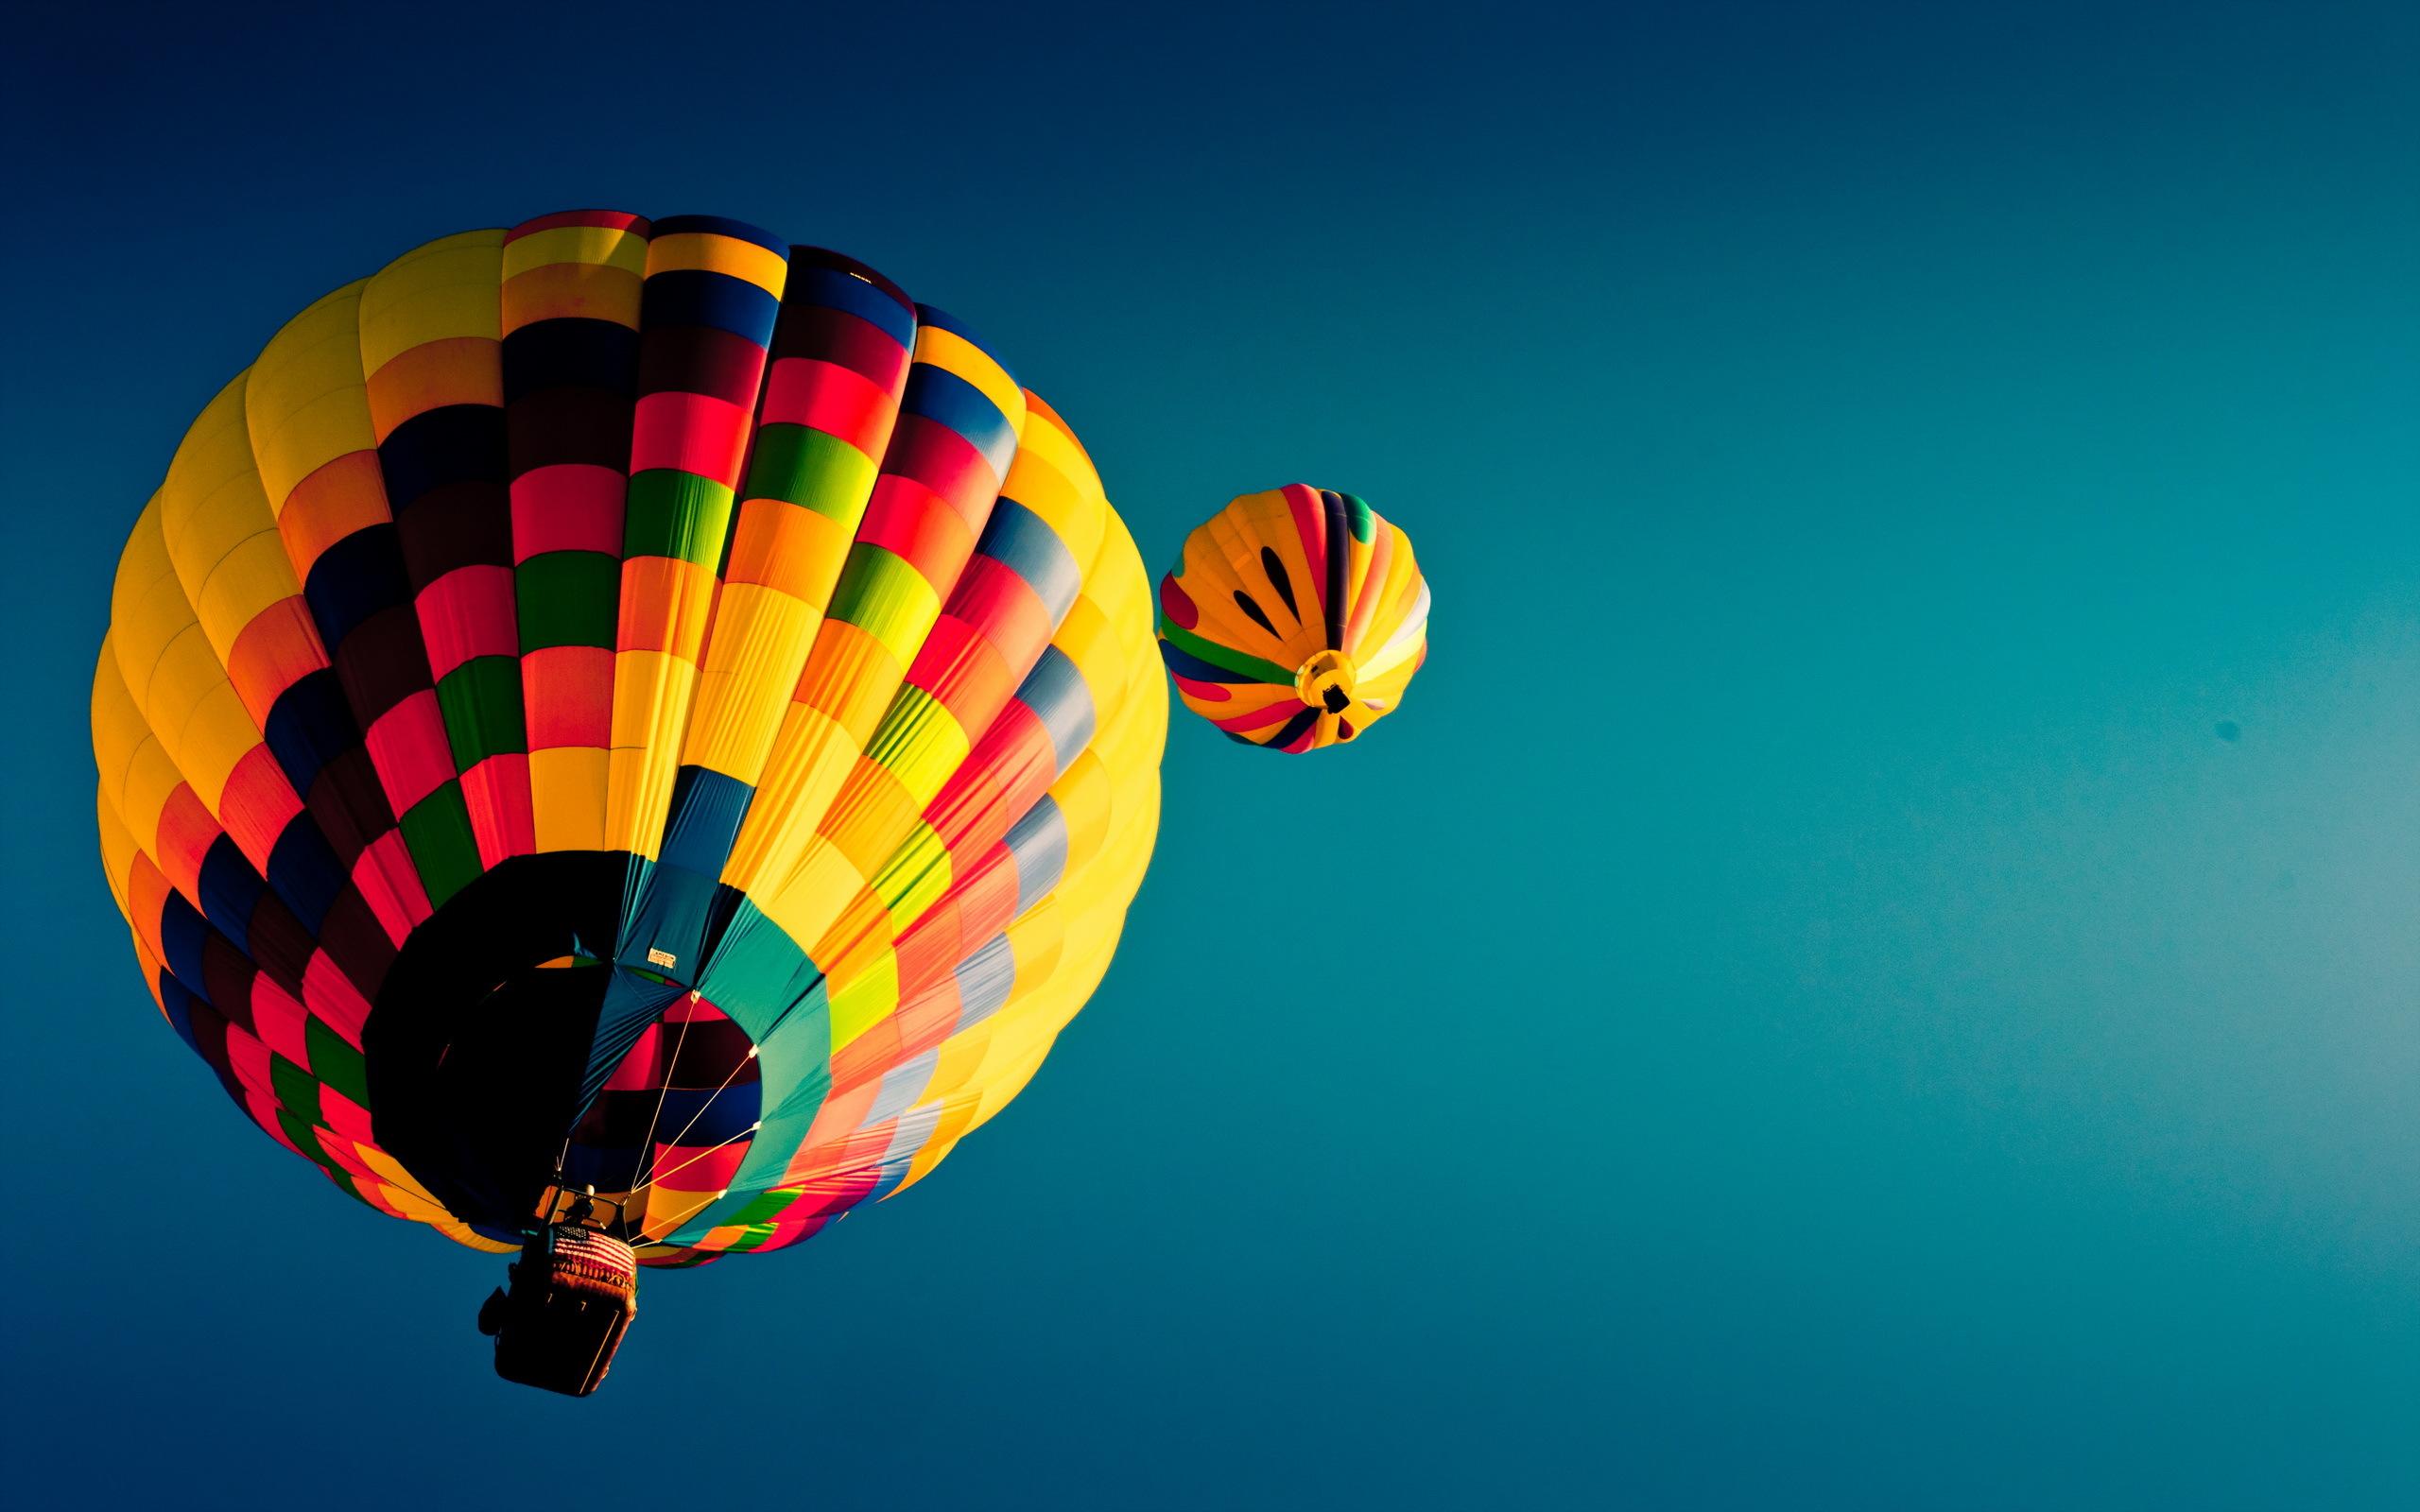 Hot air balloon full hd wallpaper and background image 2560x1600 id 452315 - Air wallpaper hd ...